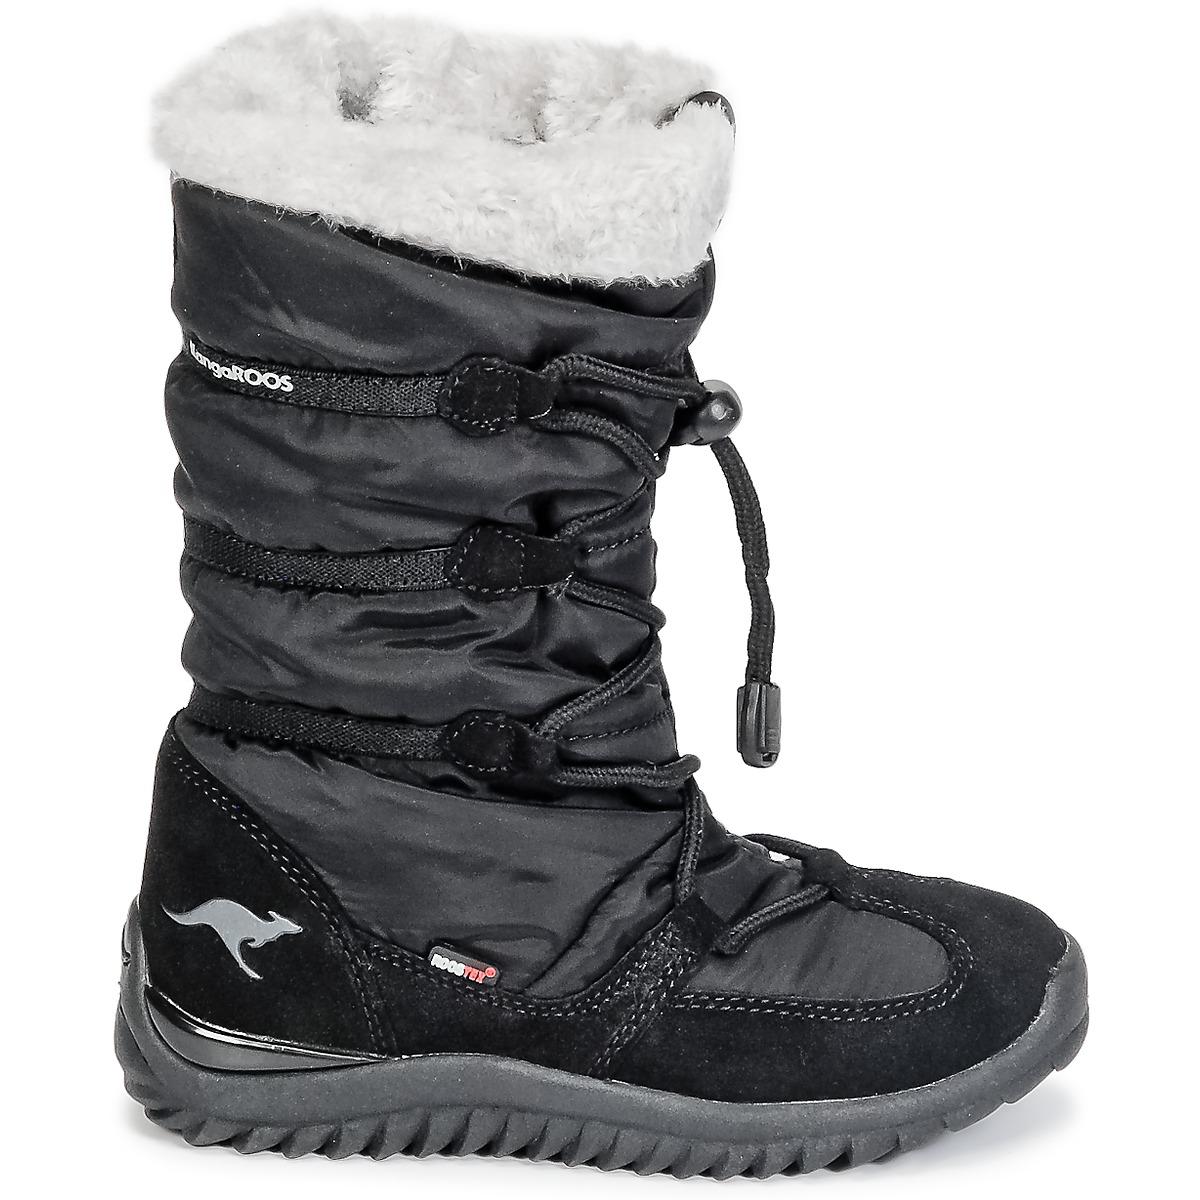 bc9f2b9544b Μπότες για σκι Kangaroos PUFFY III JUNIOR, Γυναικεία παπούτσια σκι, ΓΥΝΑΙΚΑ  | ΠΑΠΟΥΤΣΙΑ | ΣΚΙ